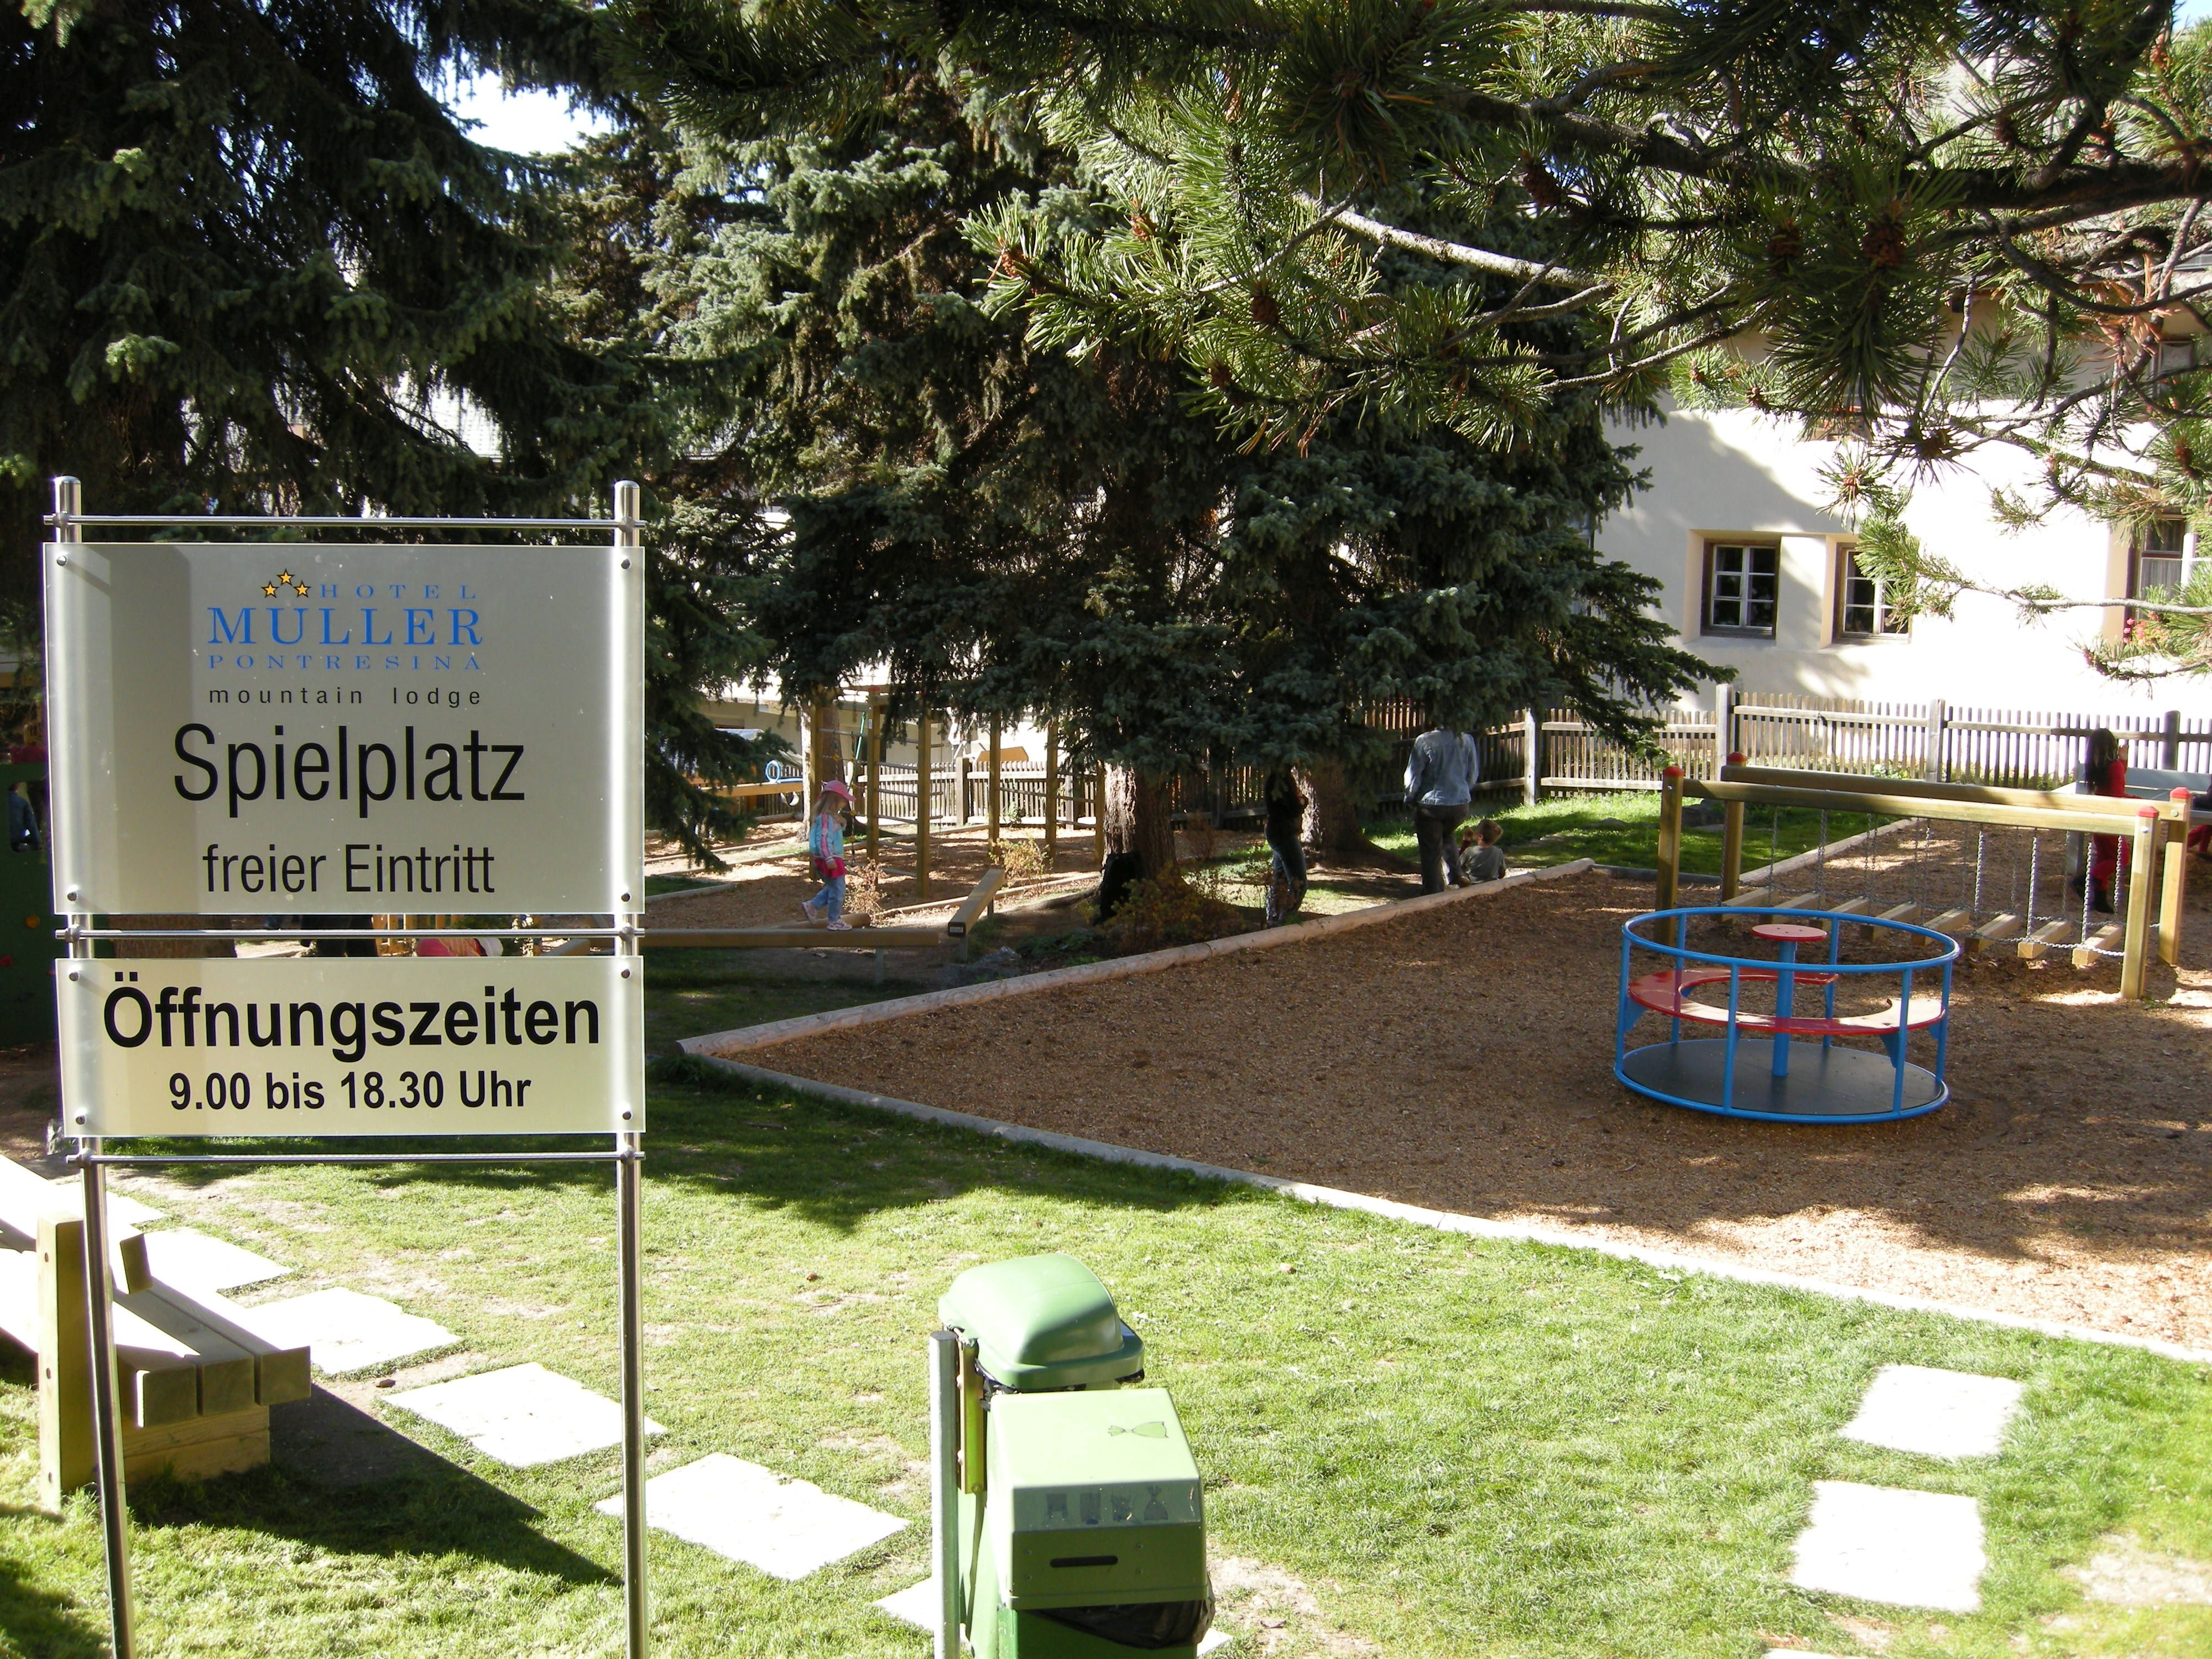 Kinderspielplatz Hotel Müller Slide 1